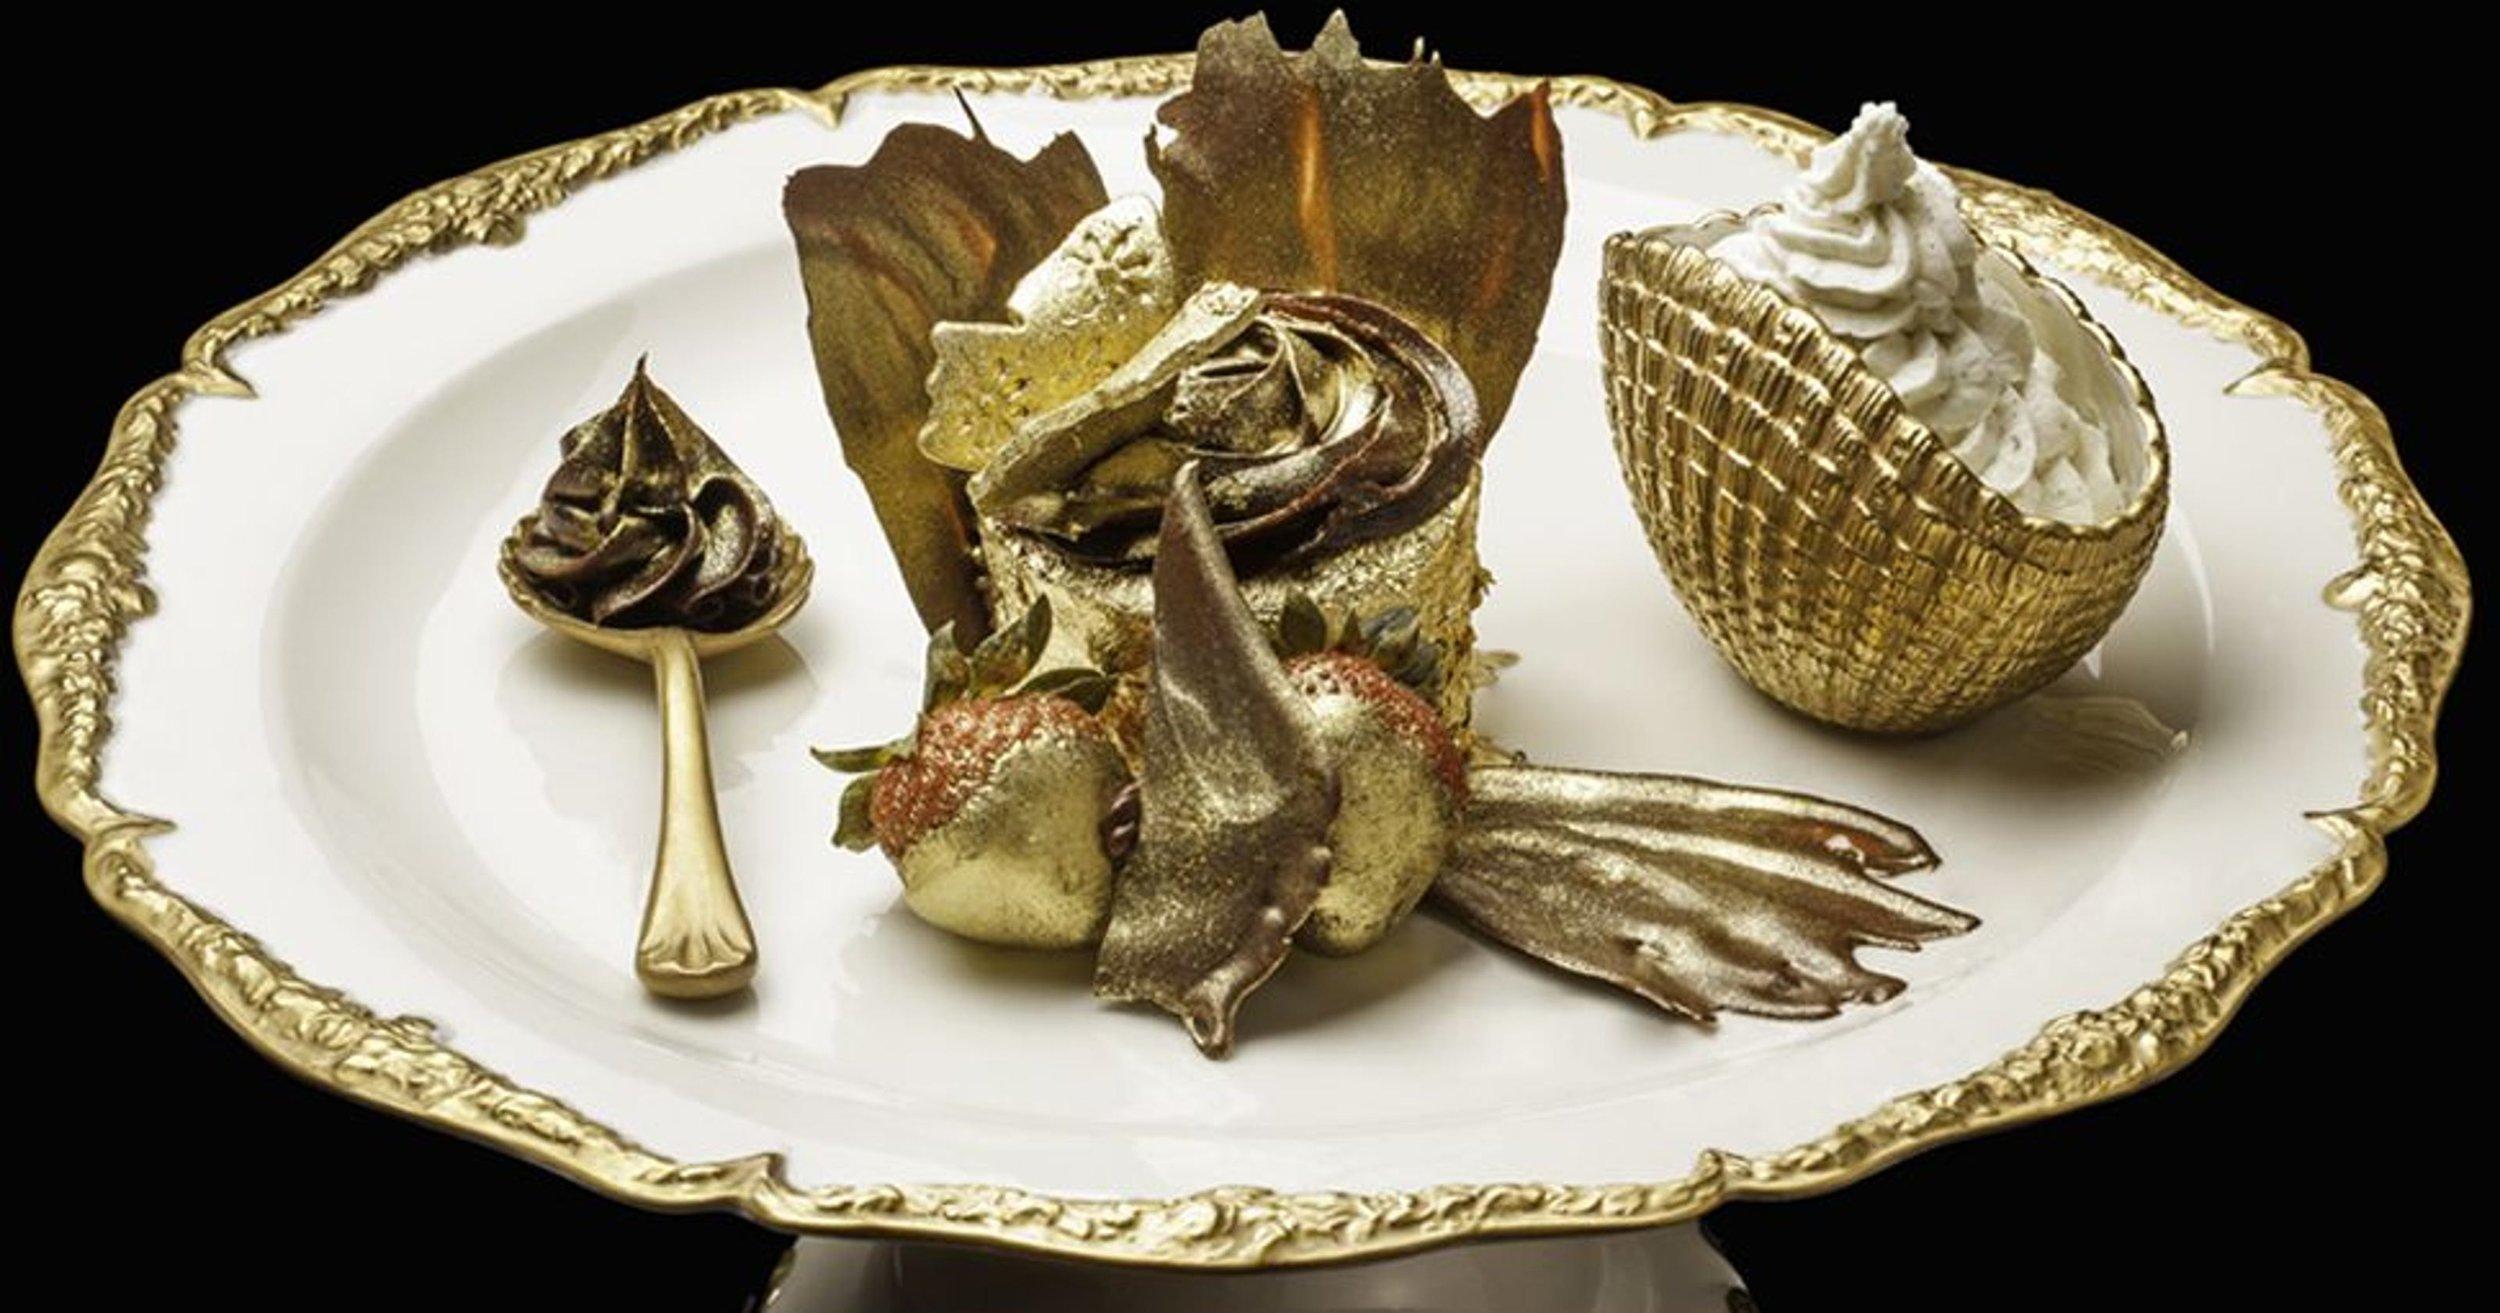 The Golden Phoenix Cupcake 2.jpg